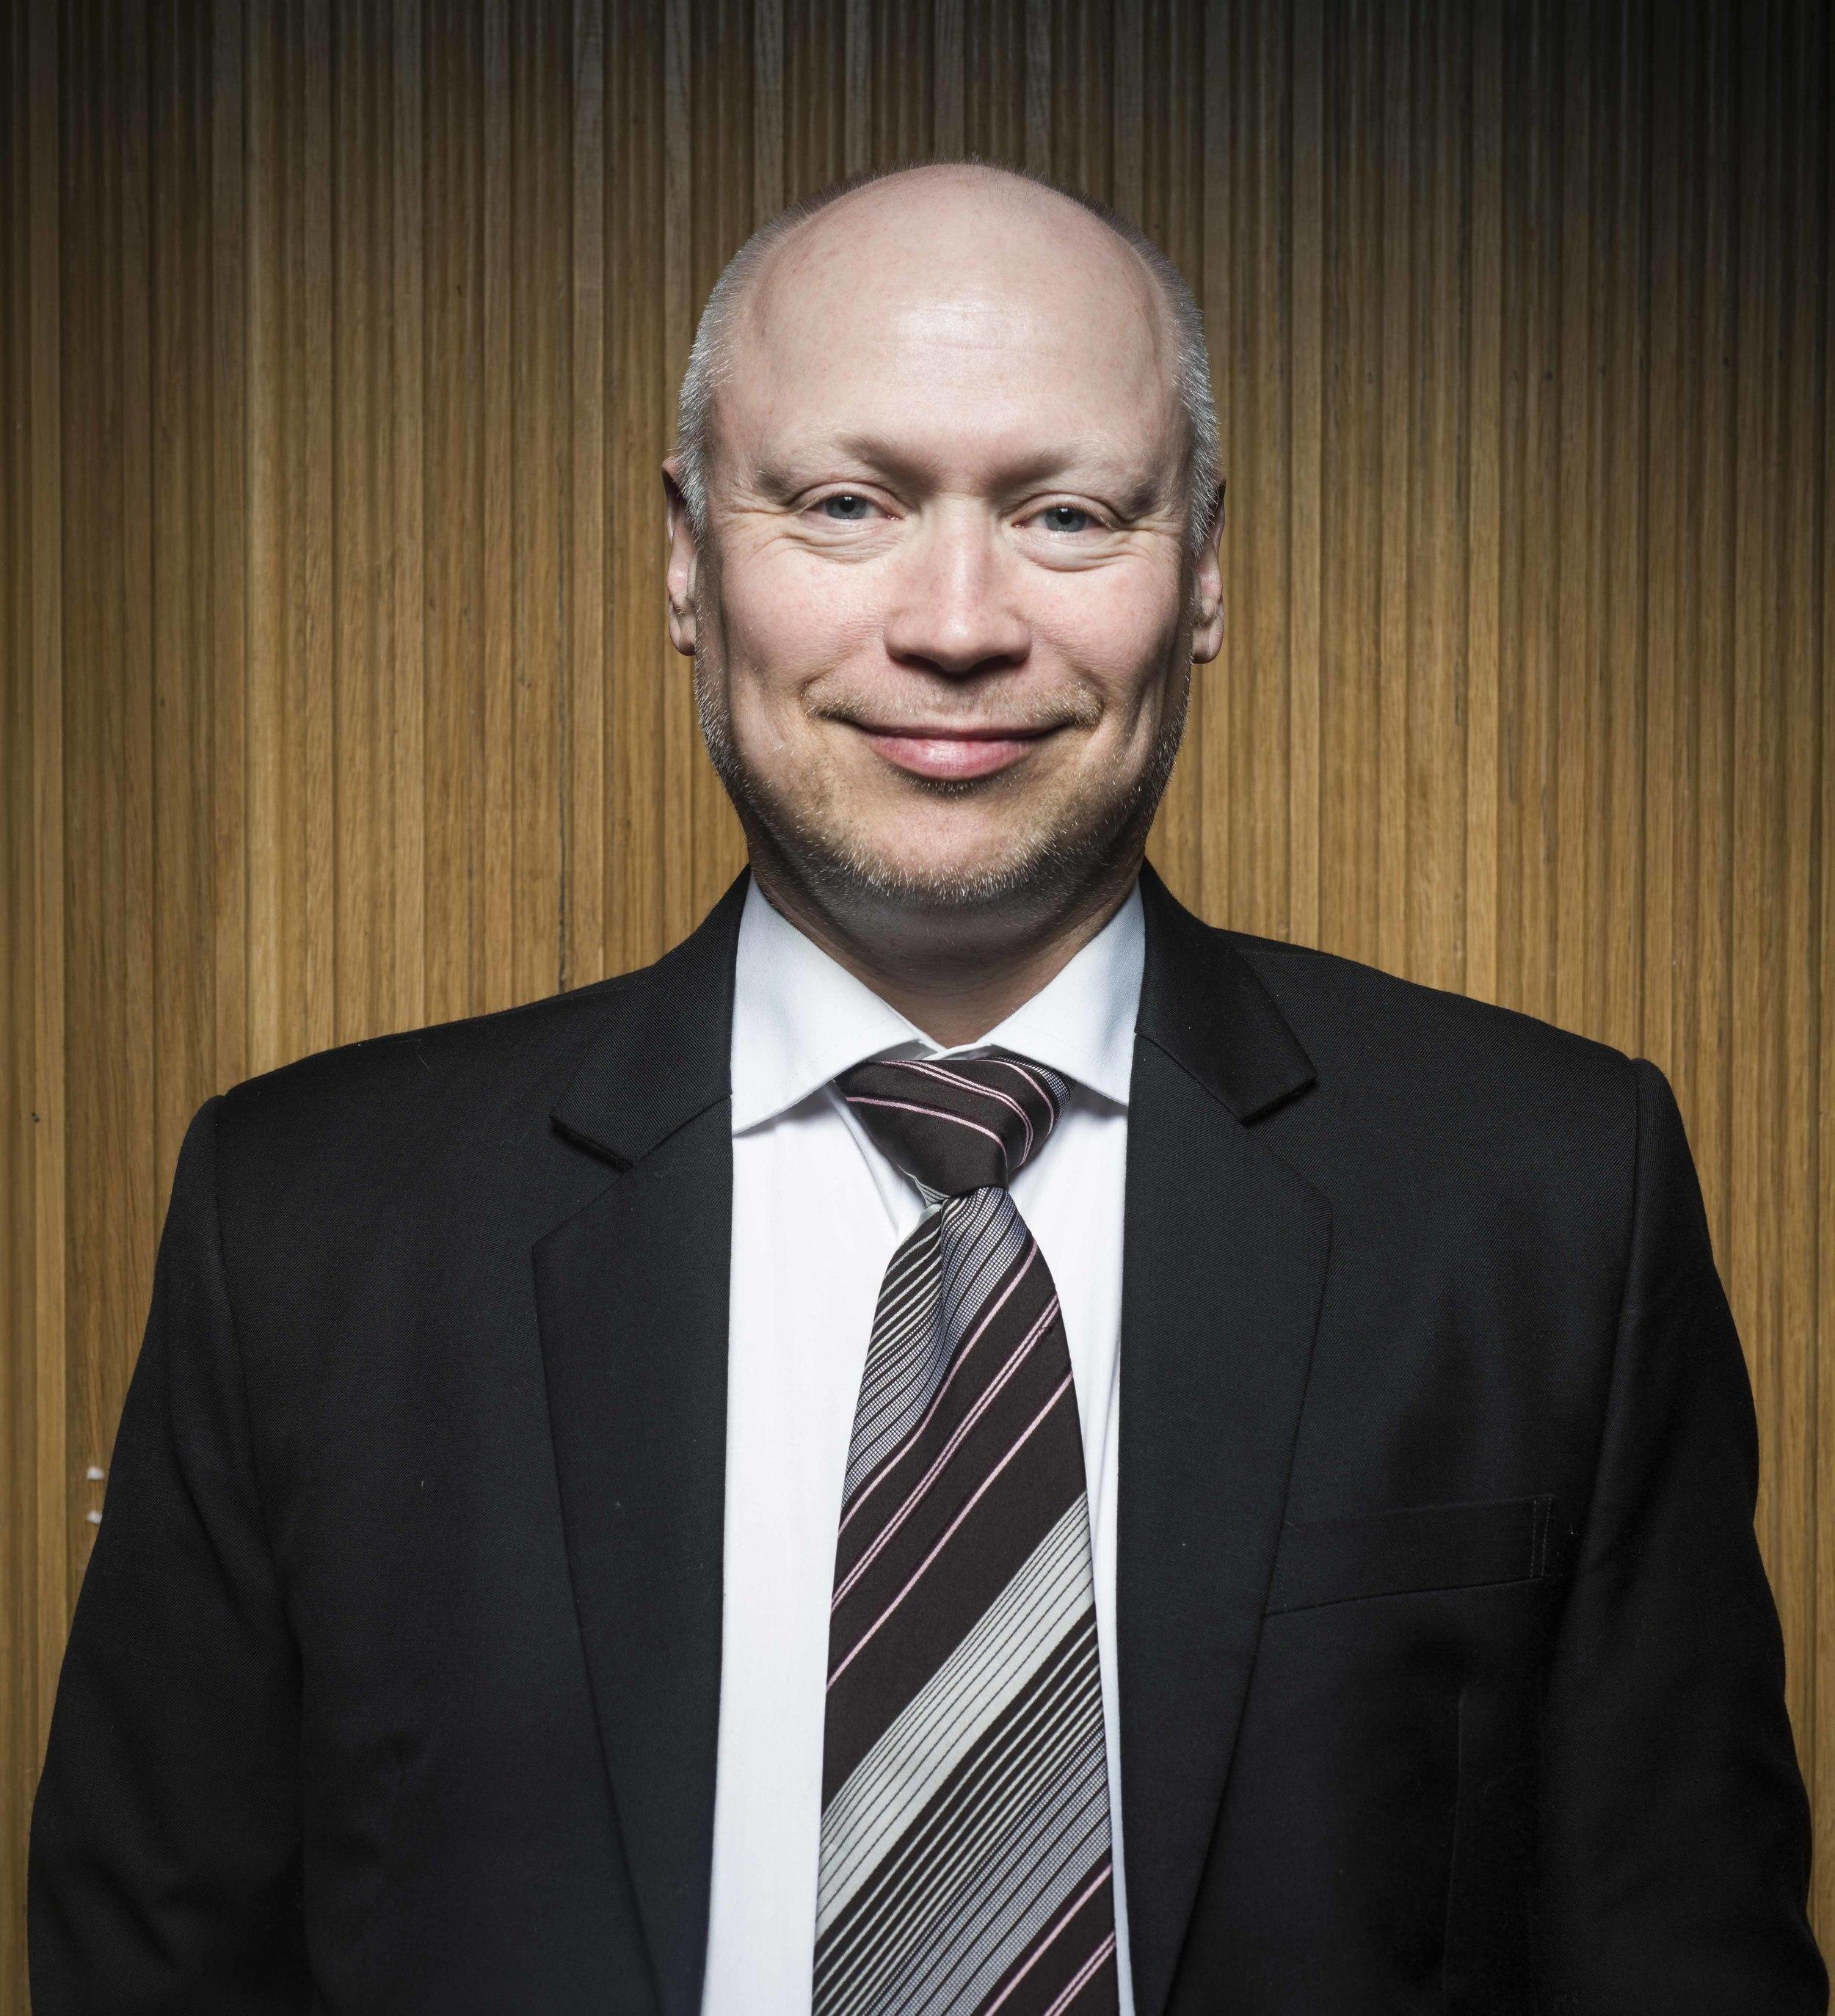 Håkon Nilsen – Clarinet - Photo: Thor Brødreskift